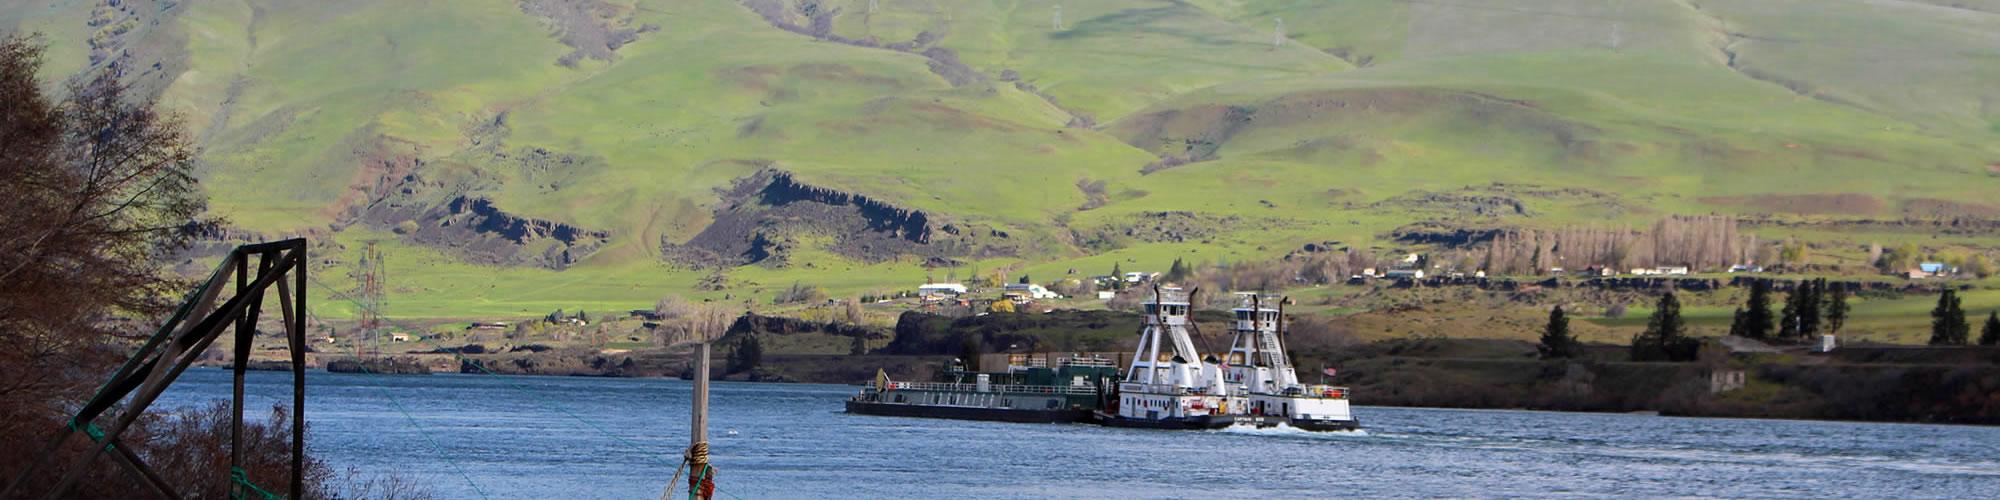 barge-columbia2